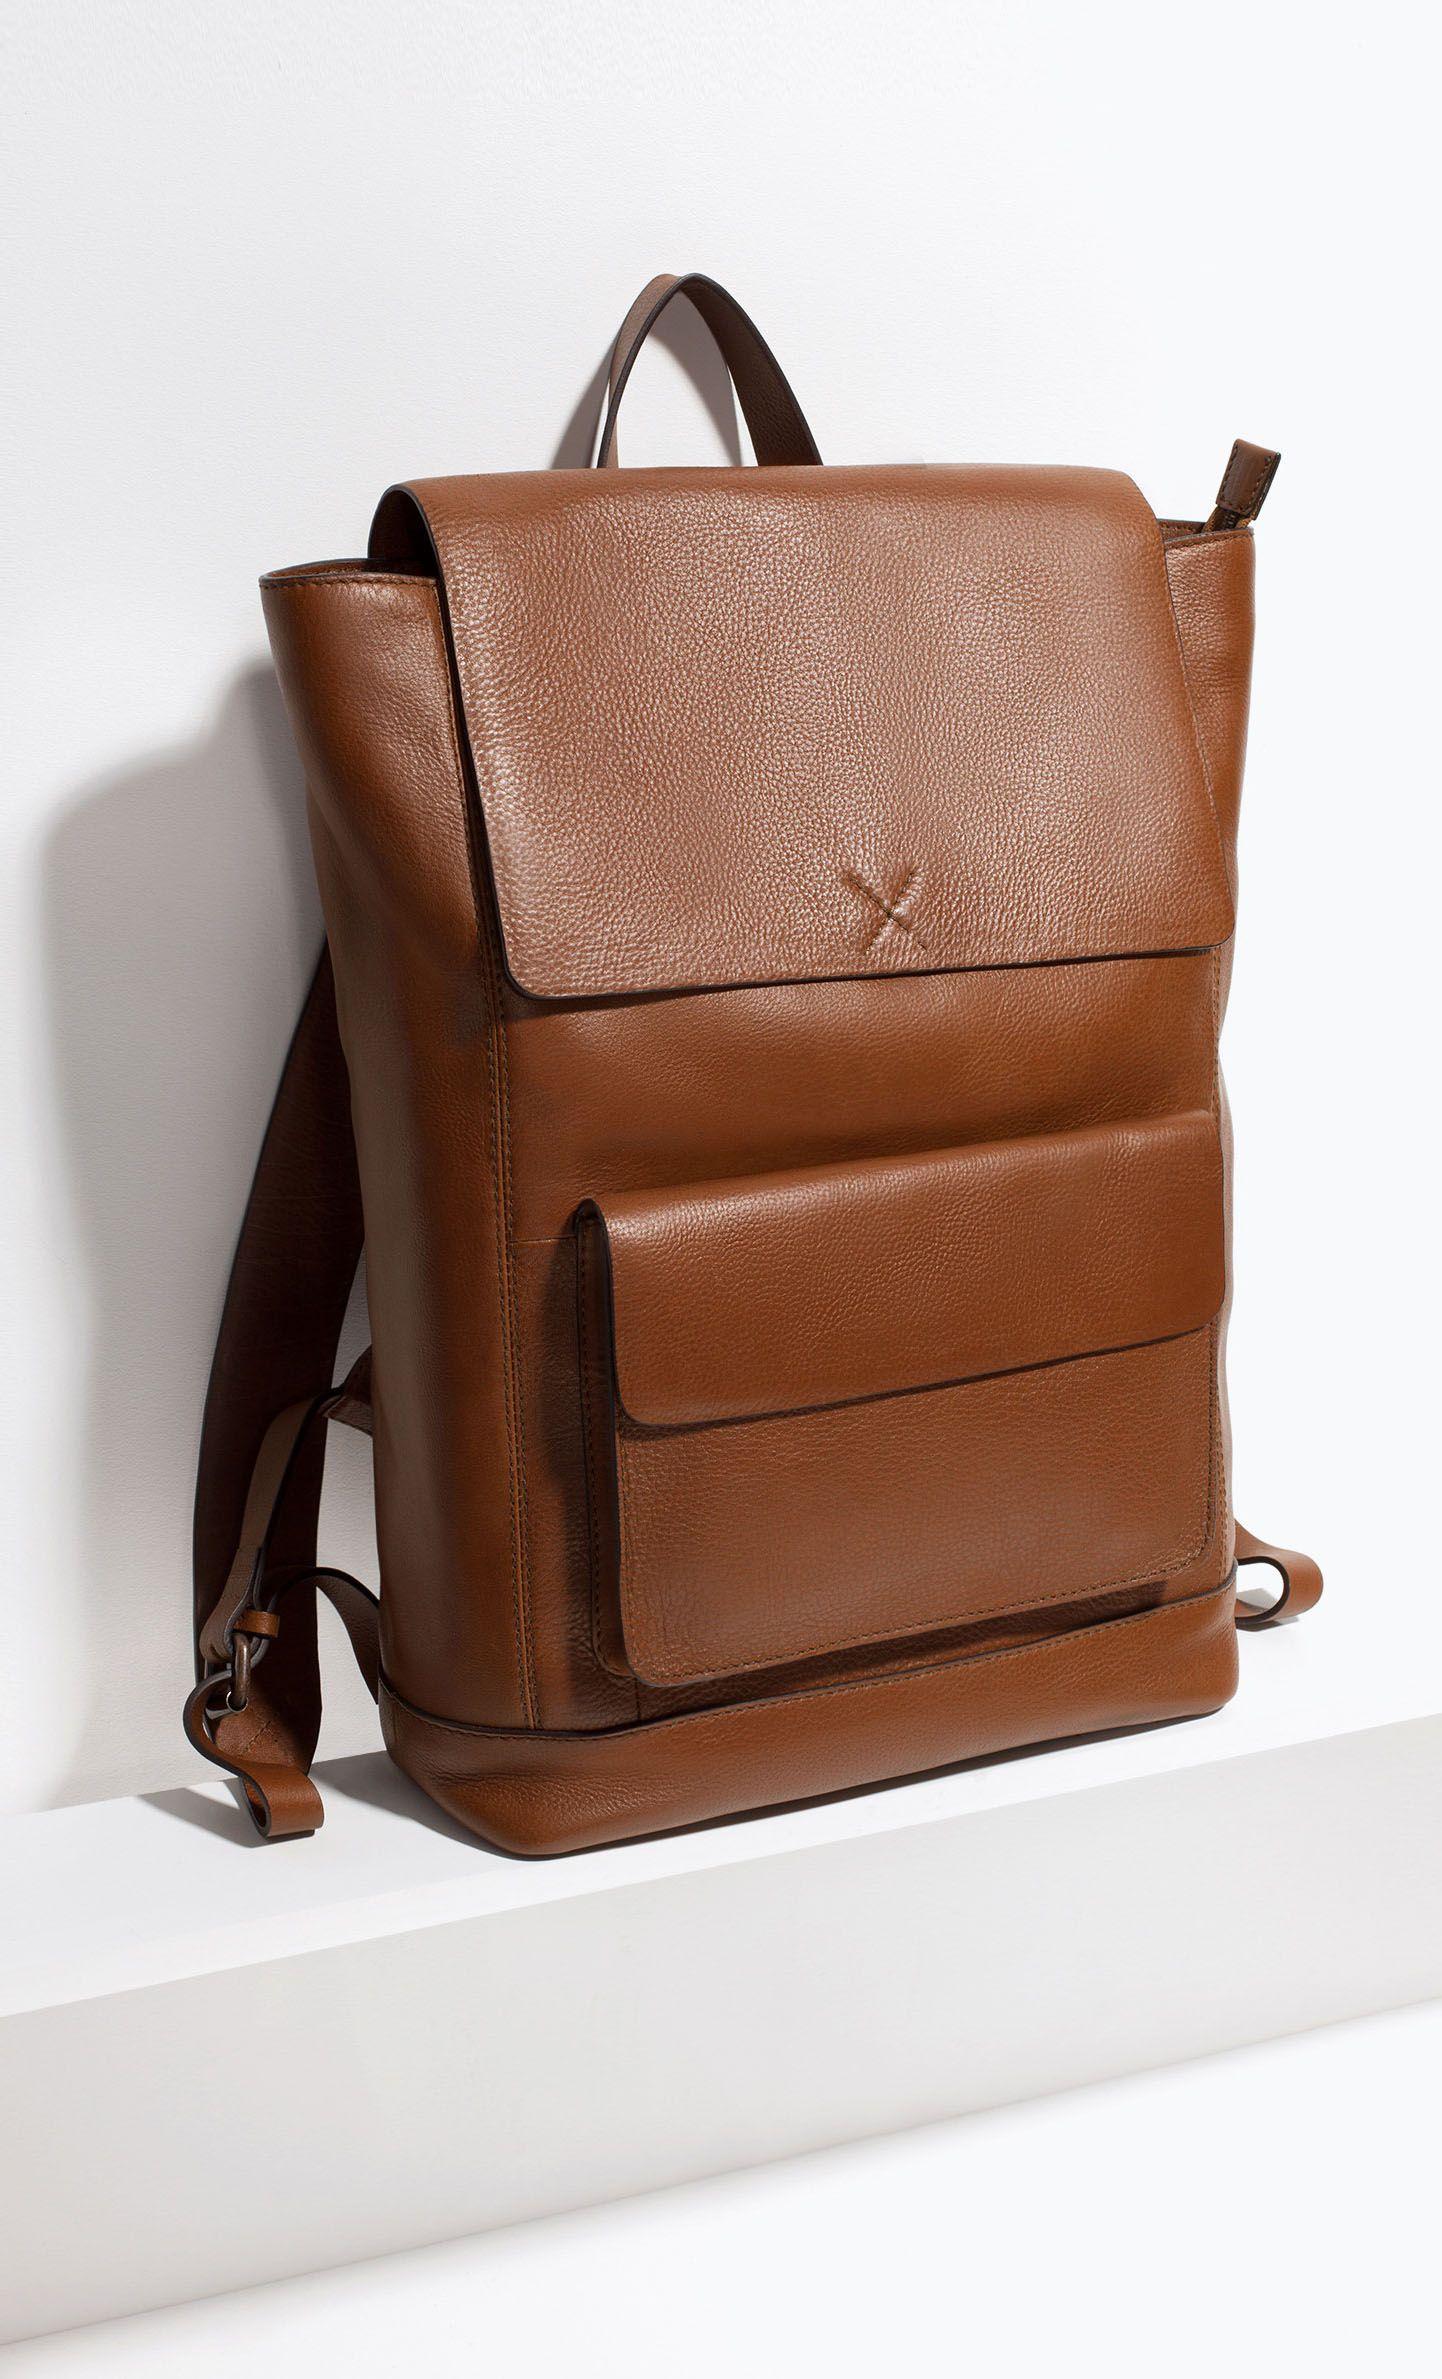 Leather Rucksack. Leather Rucksack Men s Backpack c58e9c182caa5